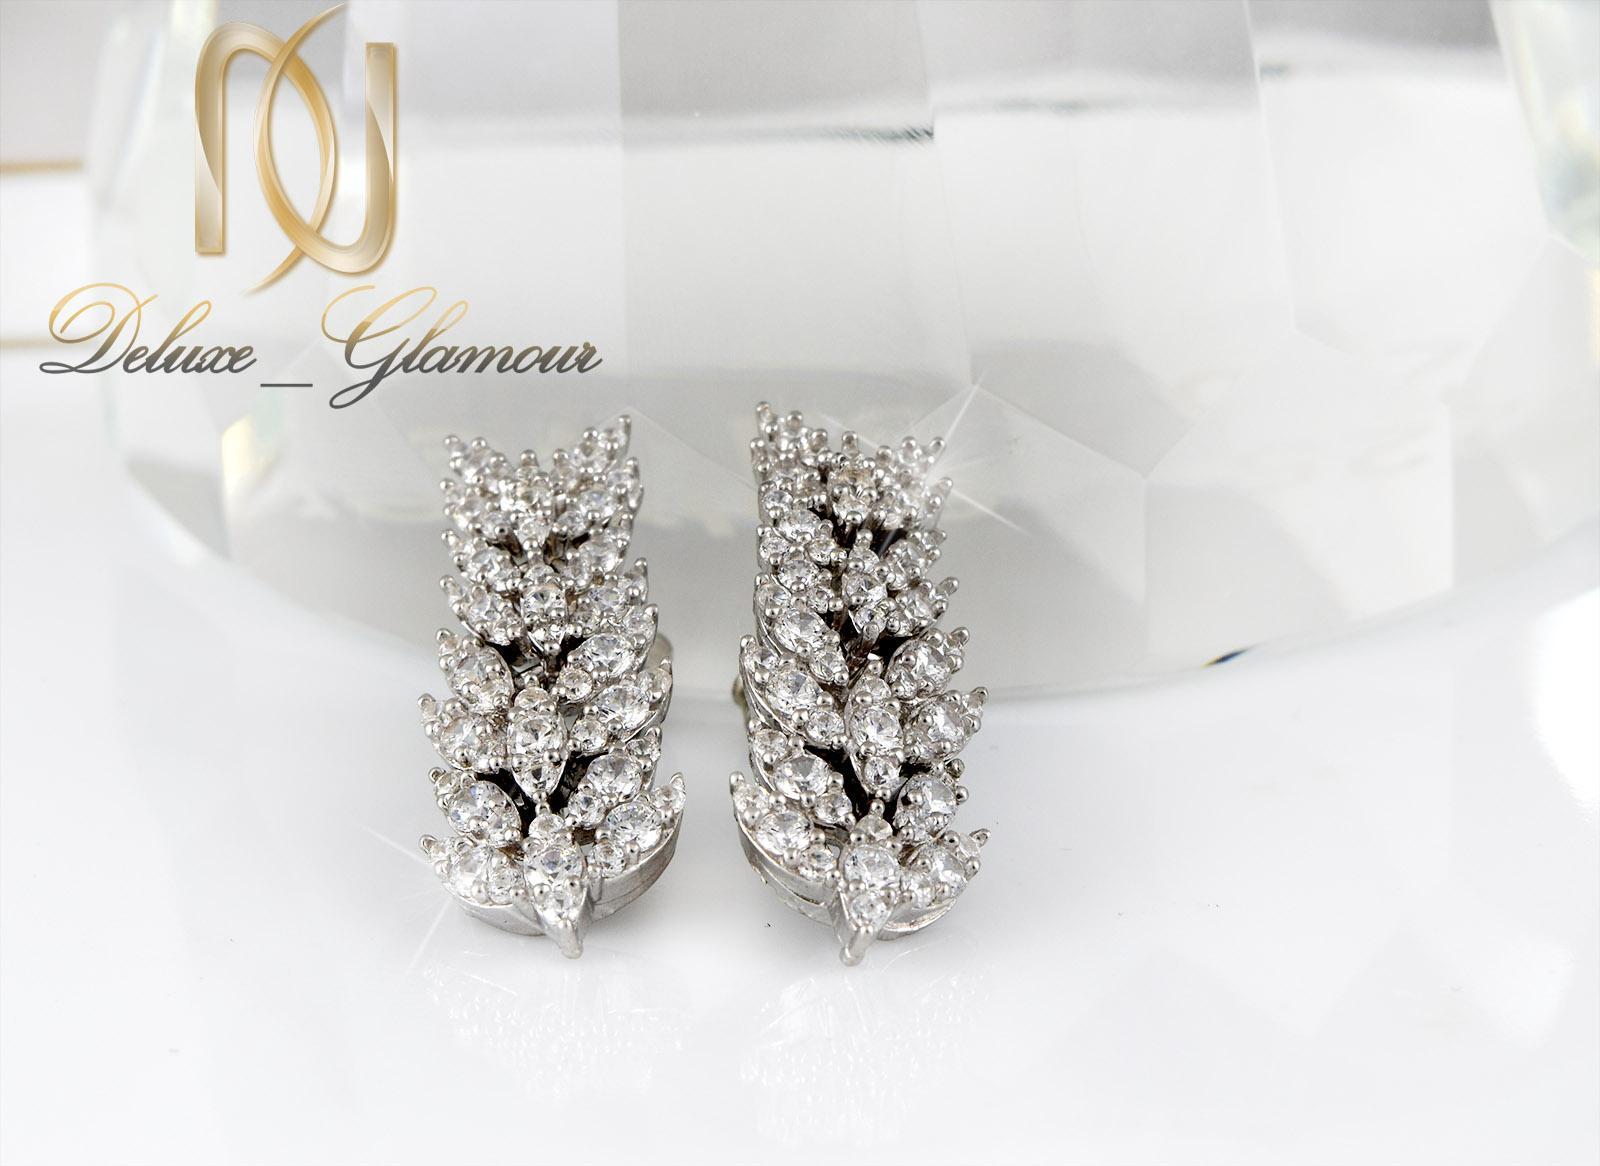 سرویس نقره عروس جواهری با نگین برلیان ns-n228